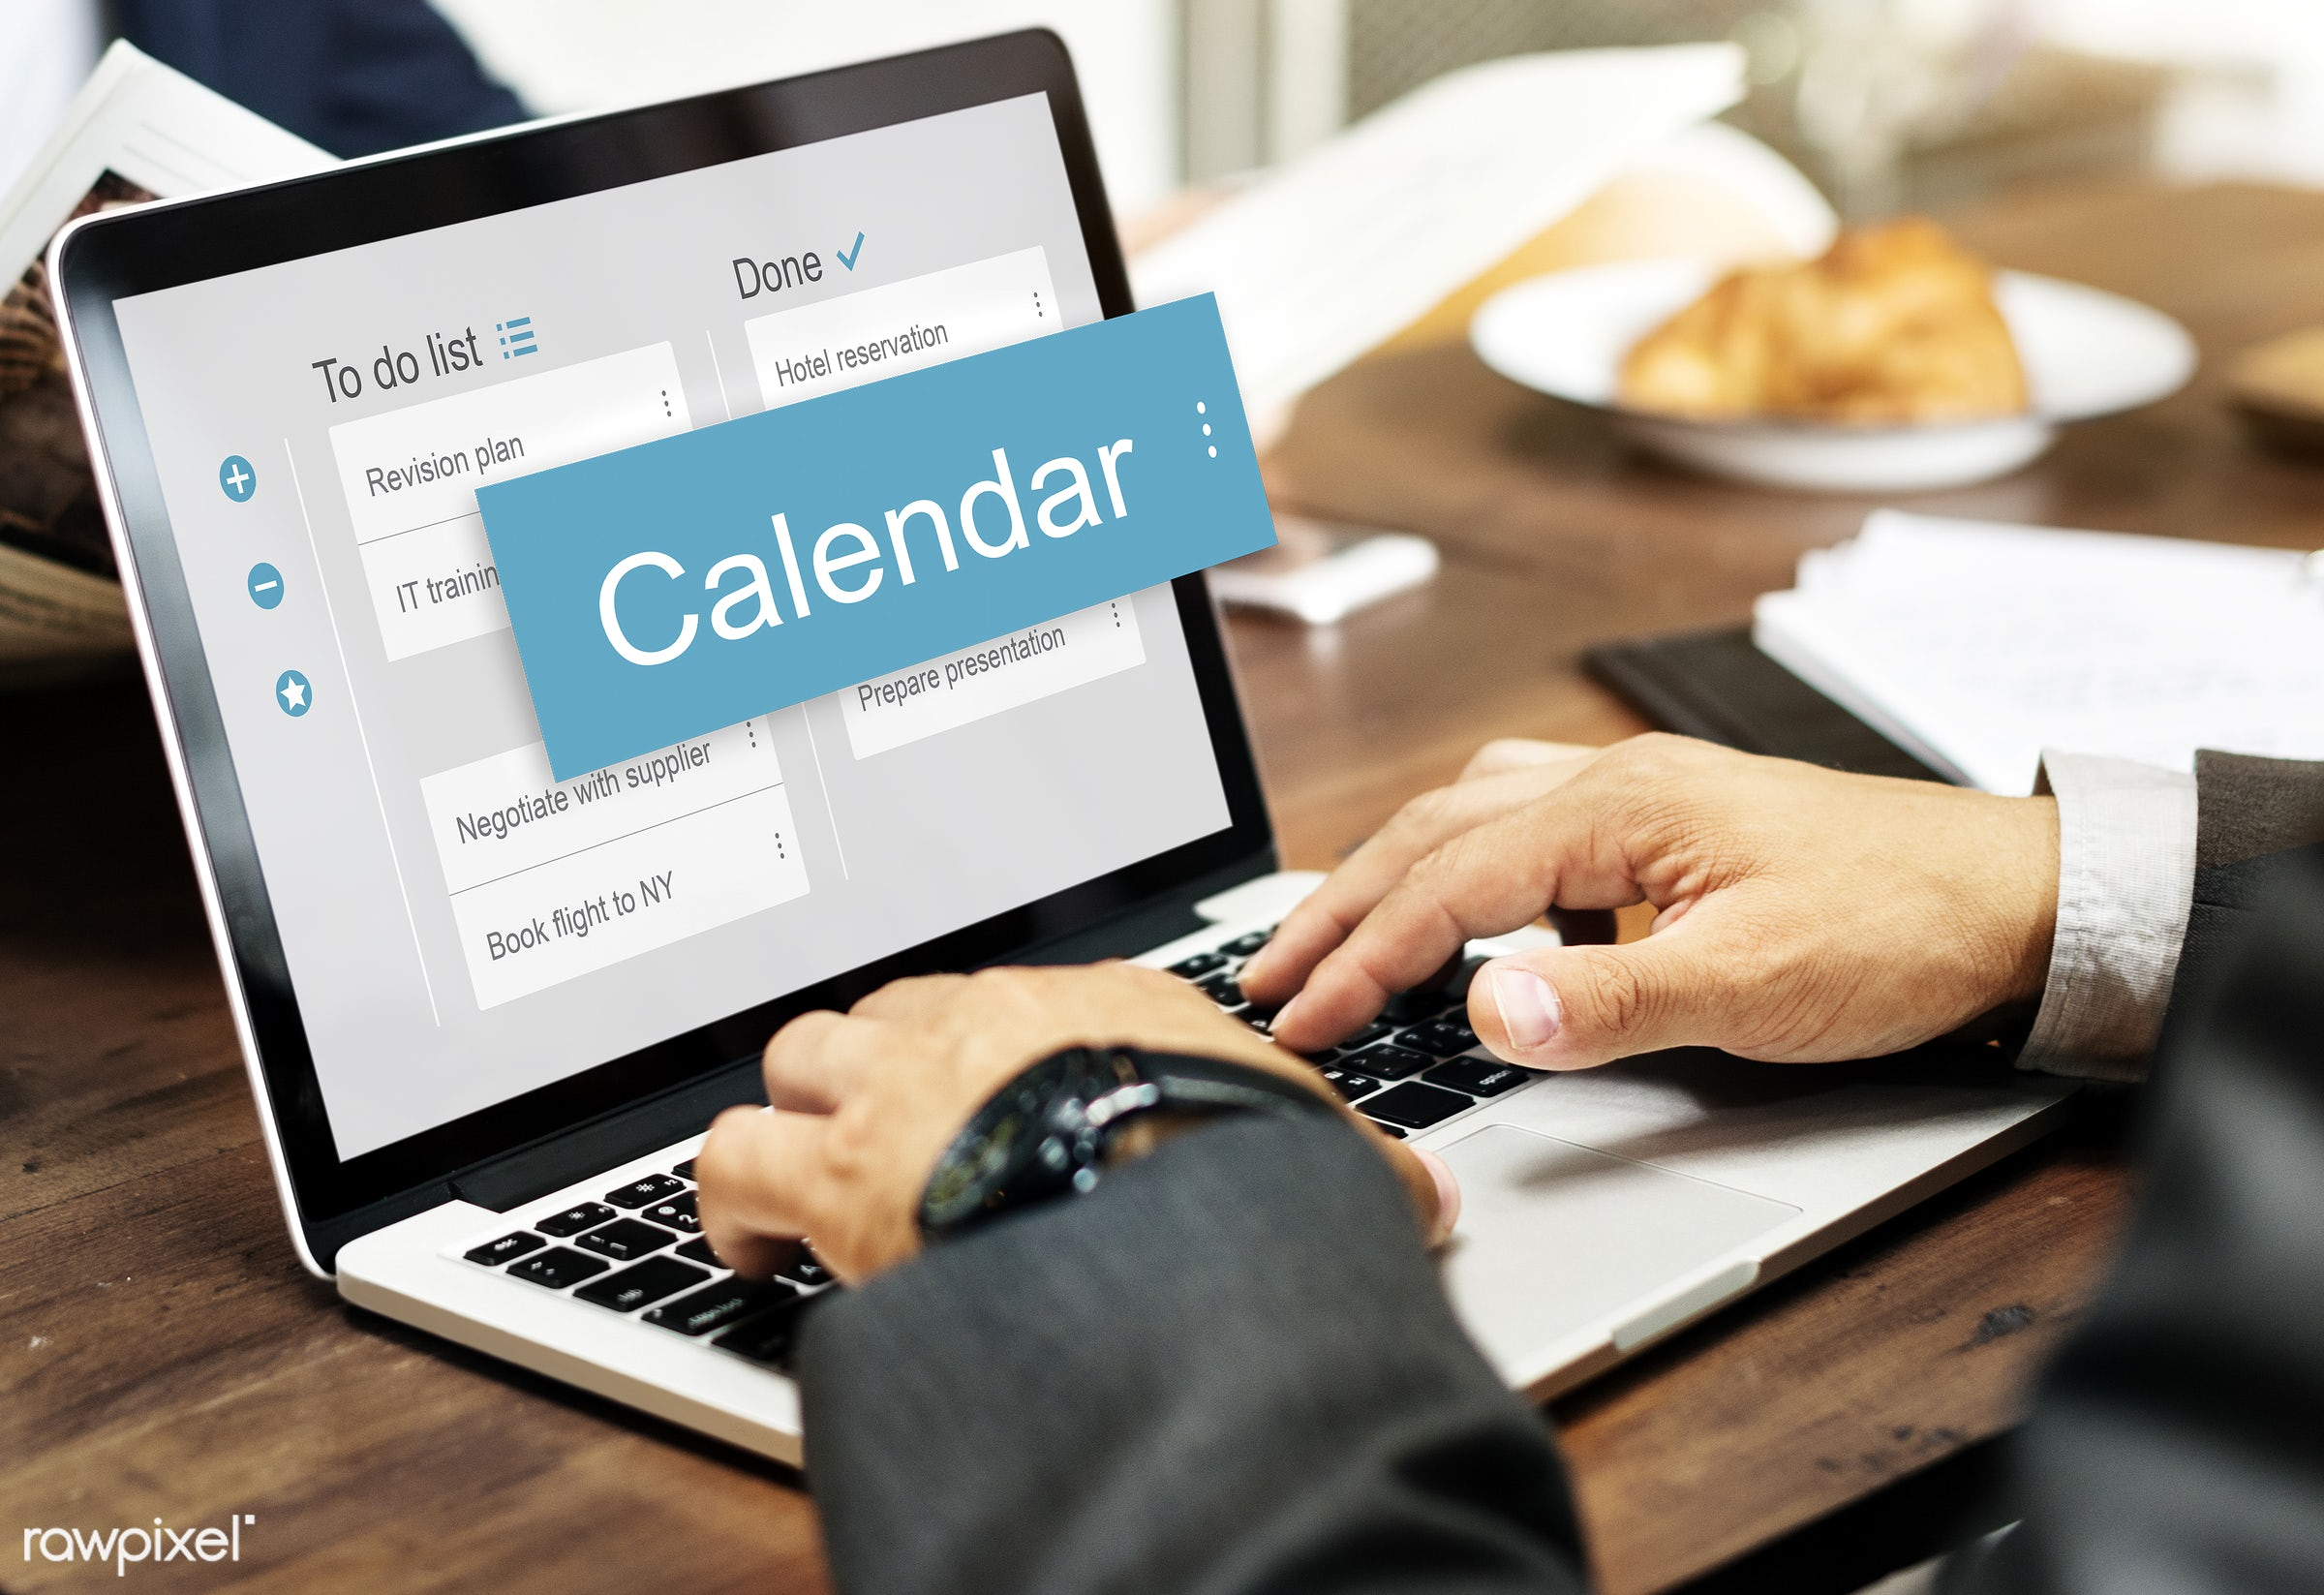 calendar, agenda, app, appointment, browse, business, businessman, cafe, checklist, corporate, device, digital, digital...